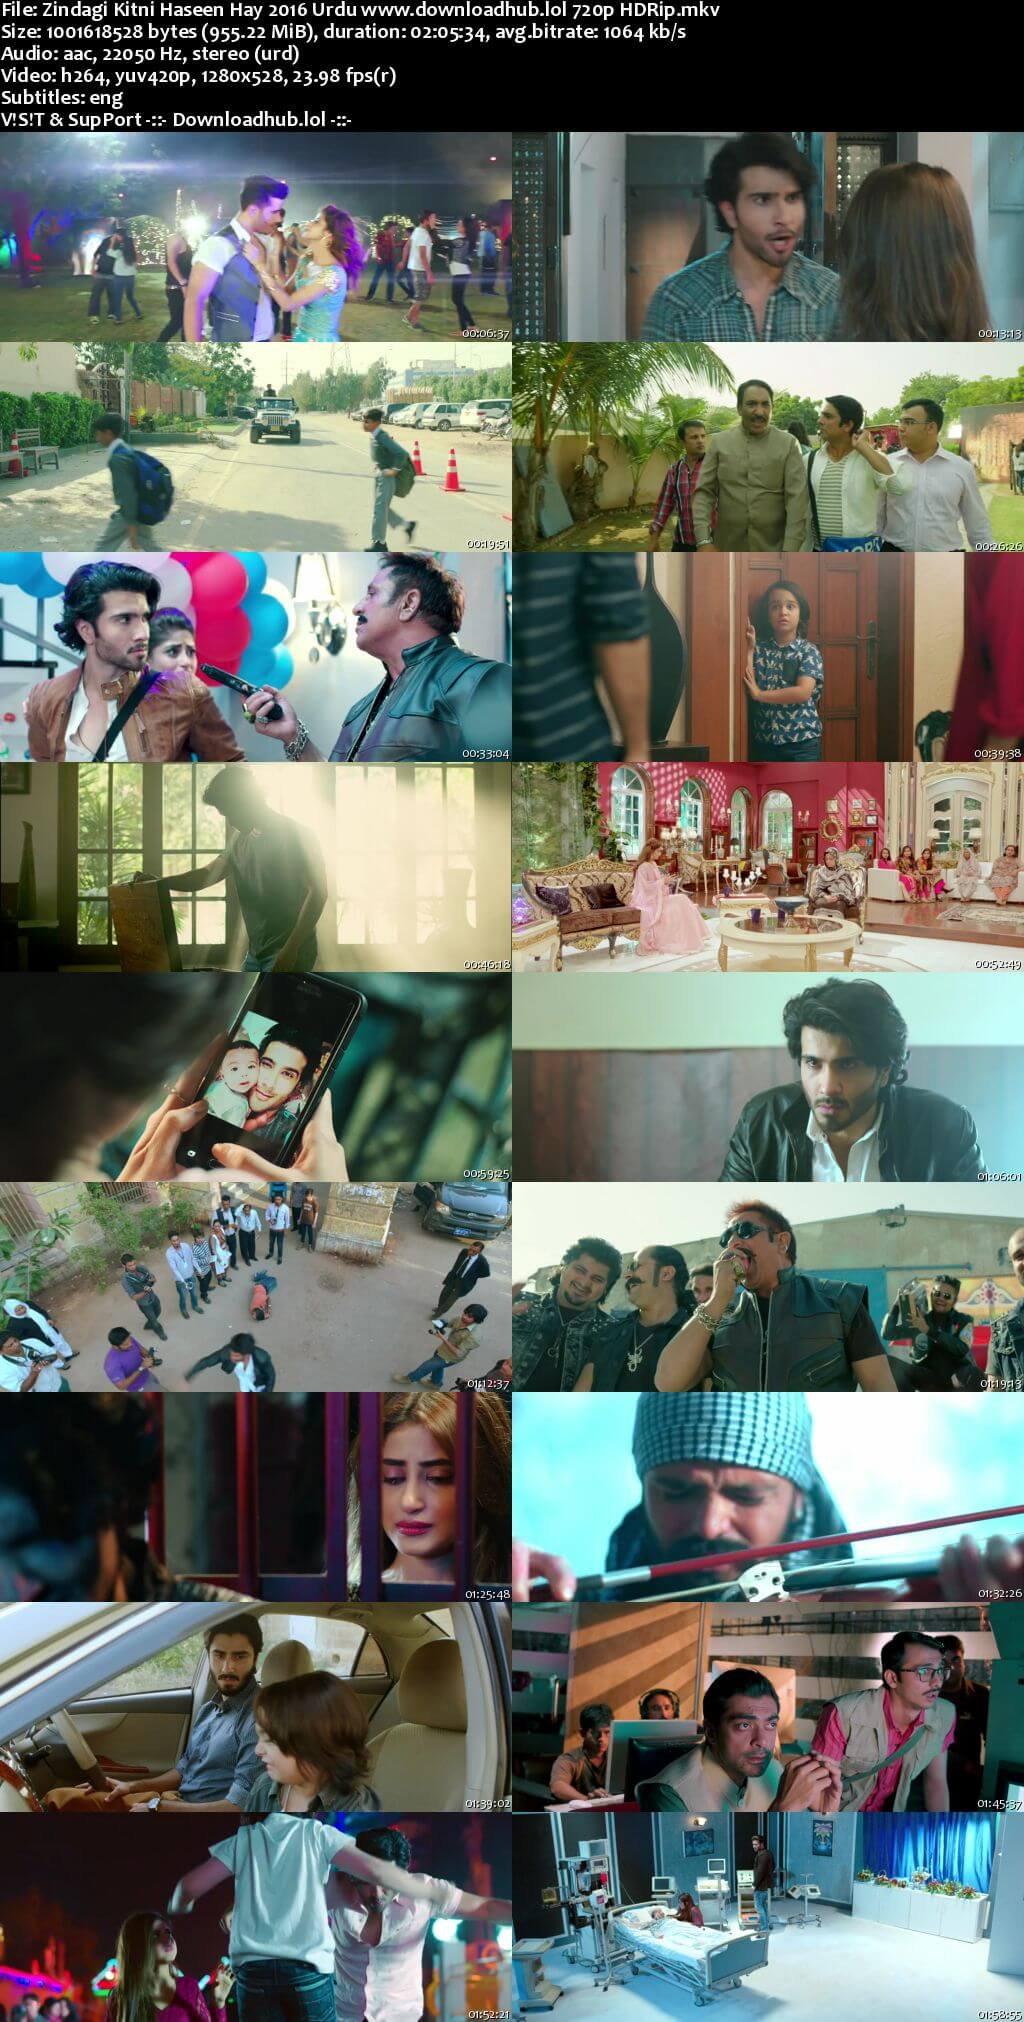 Zindagi Kitni Haseen Hay 2016 Urdu 720p HDRip ESubs